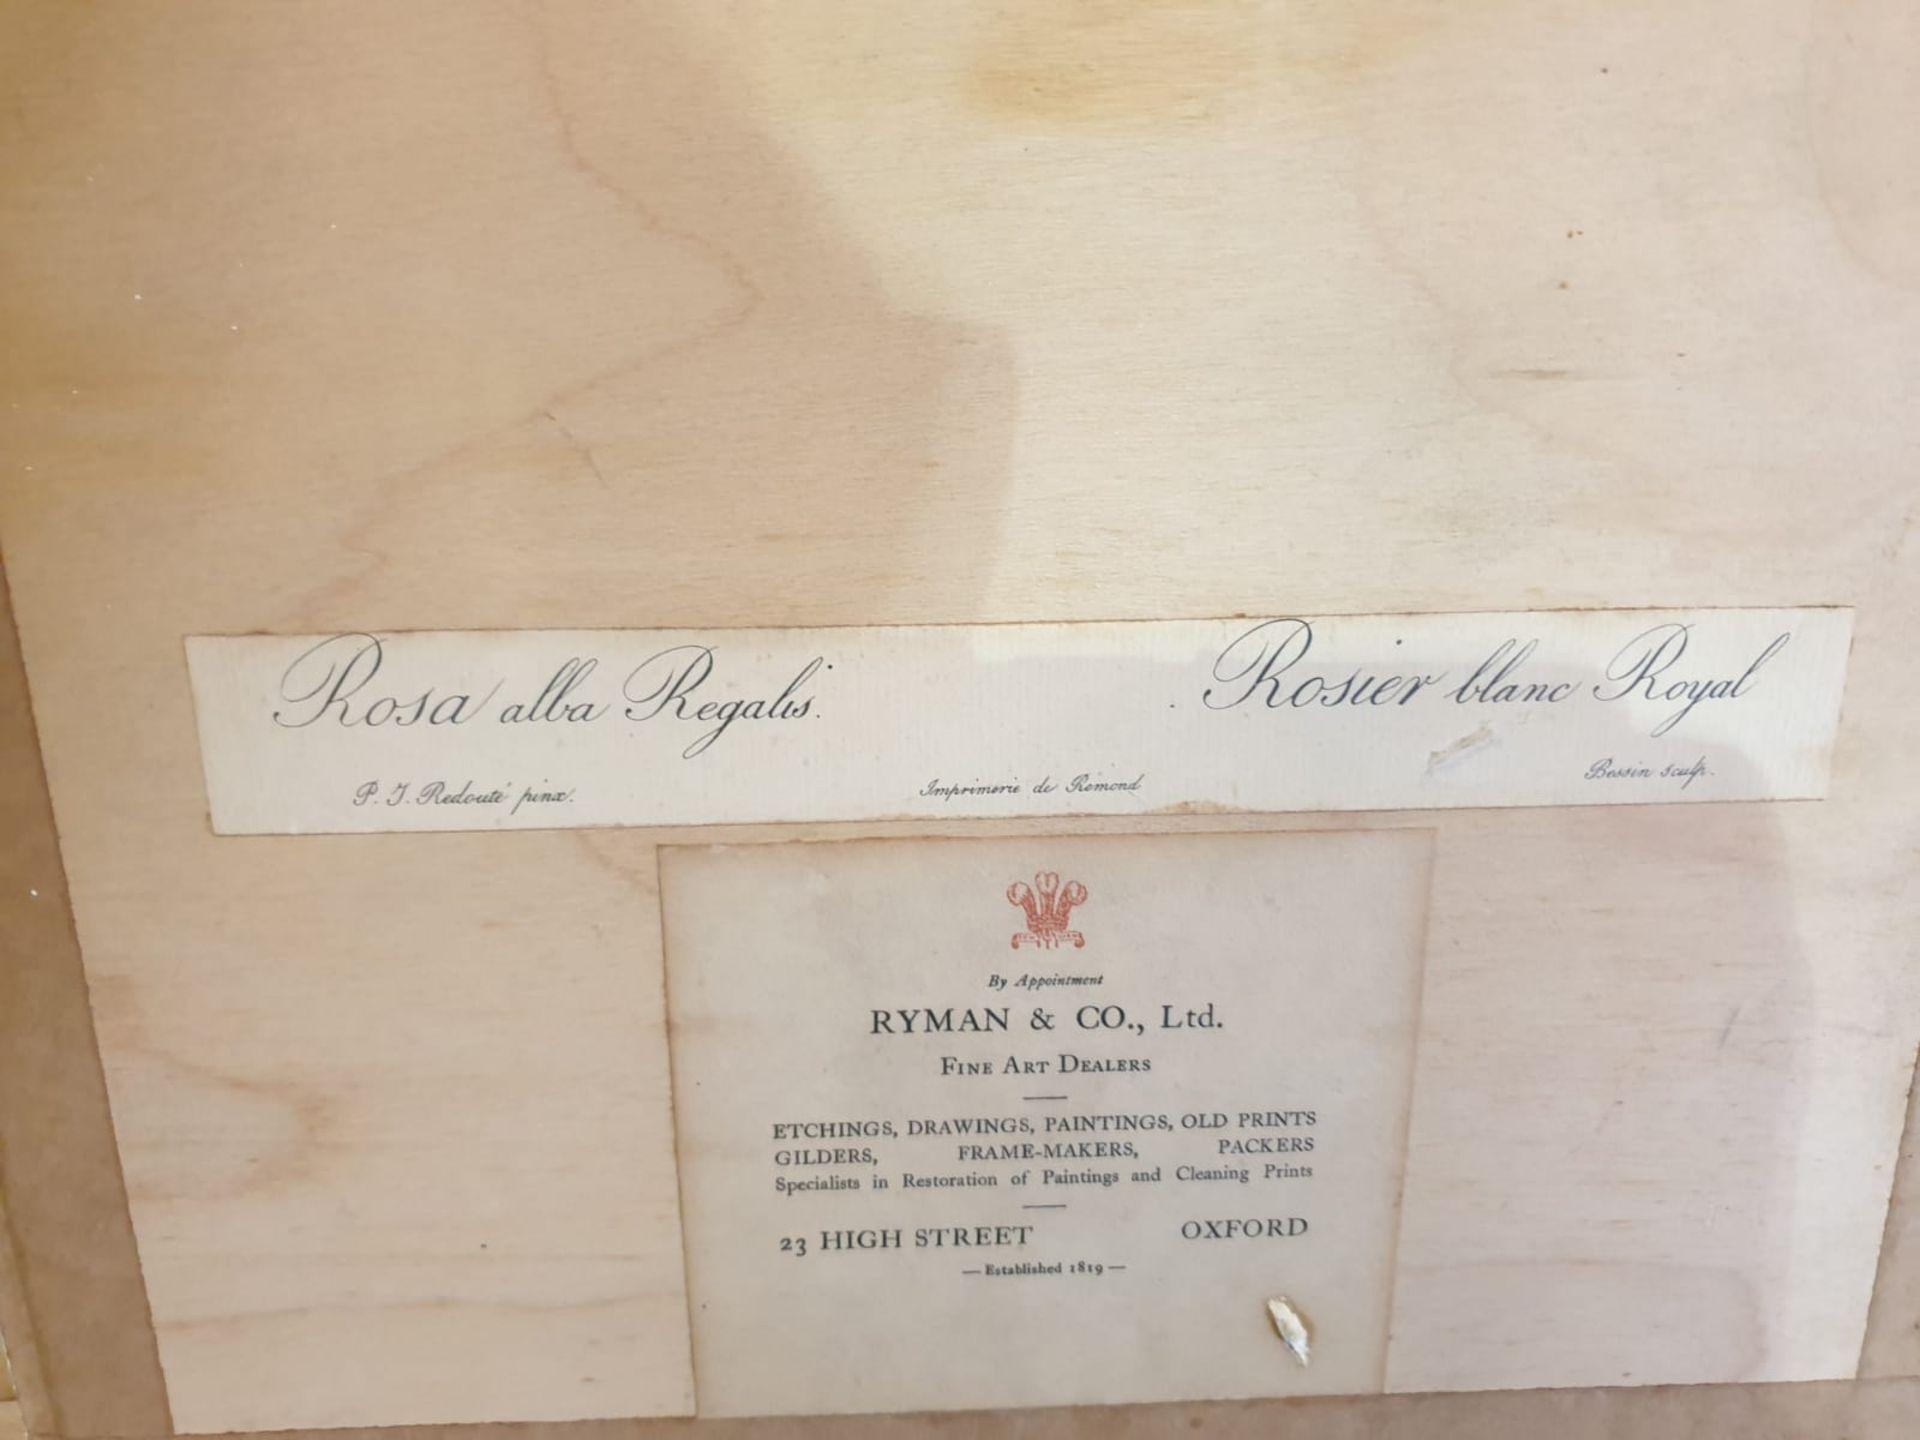 Framed botanical vintage print Rosa alla Regalis Pierre-Joseph Redouté (1759 –1840), was a - Image 3 of 3